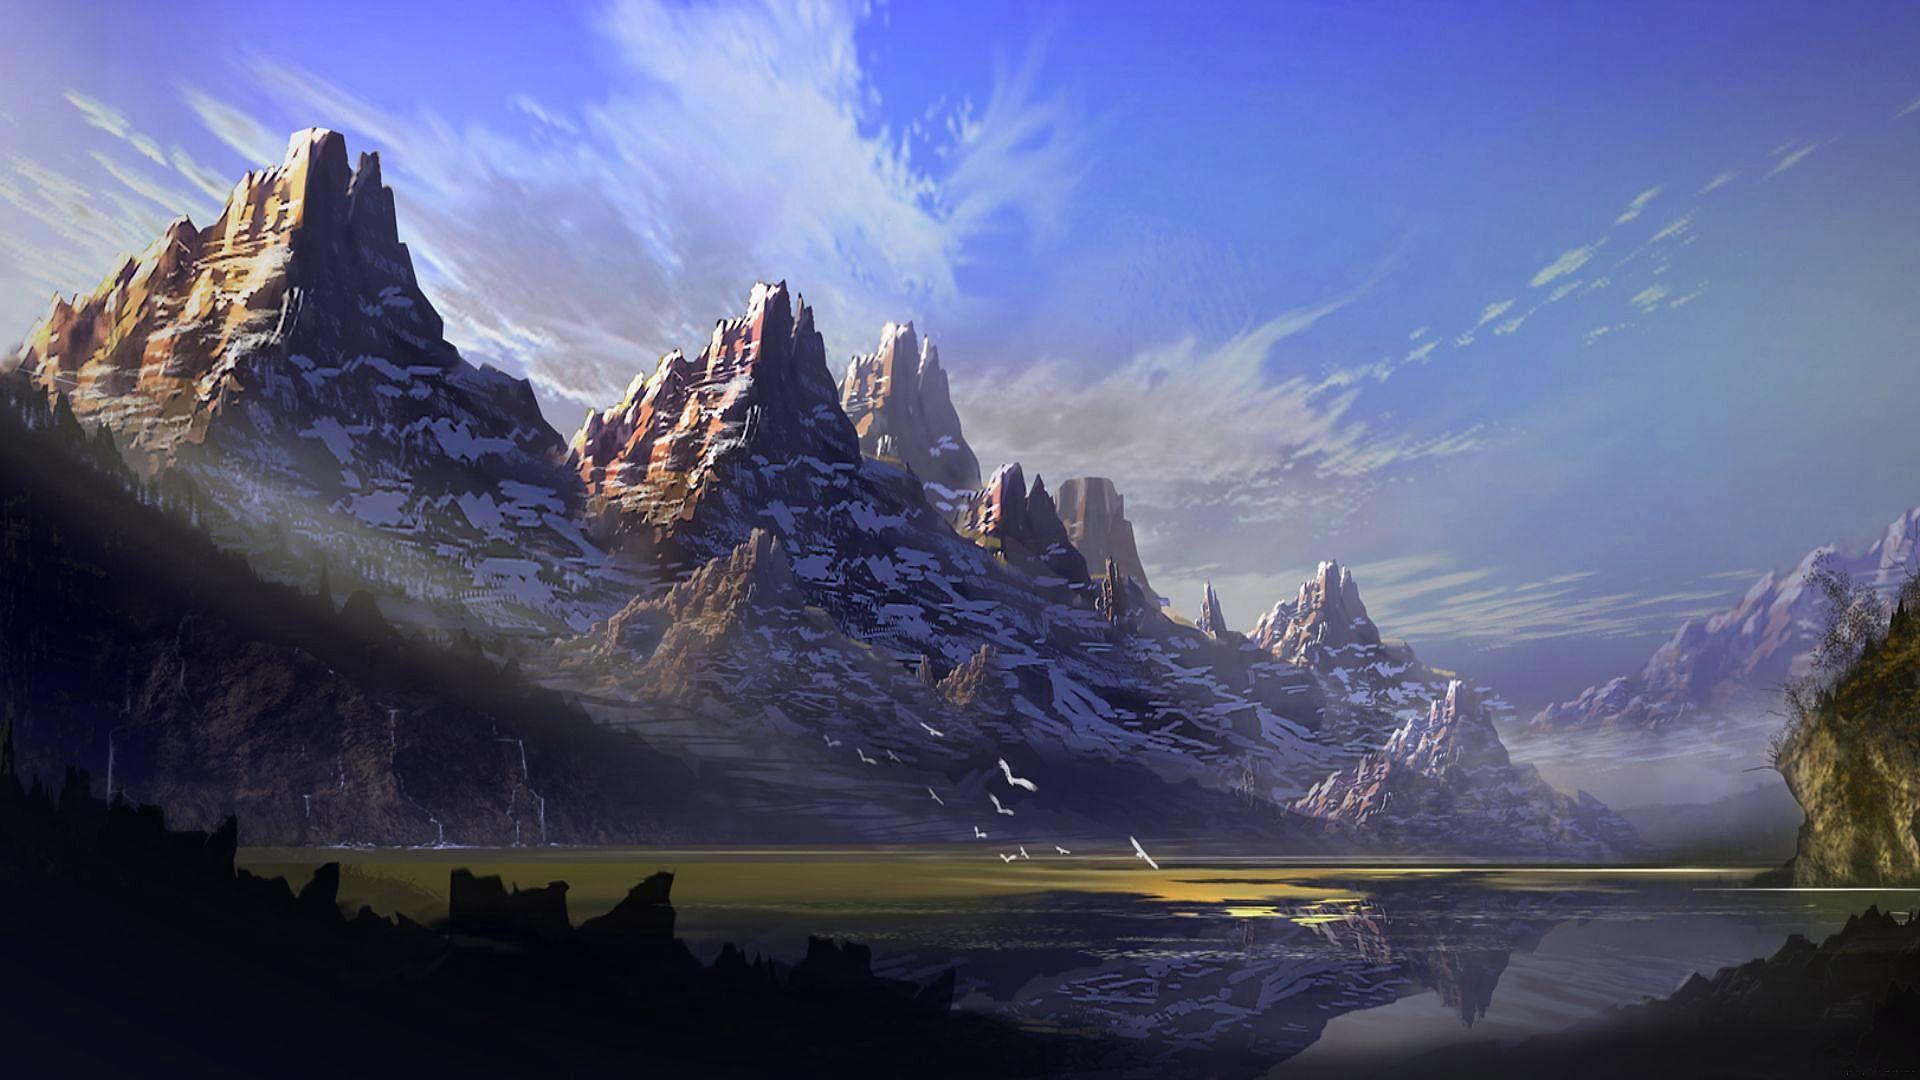 Fondo Escritorio Picos Montañas Nevadas: Montañas Nevadas, Paisajes